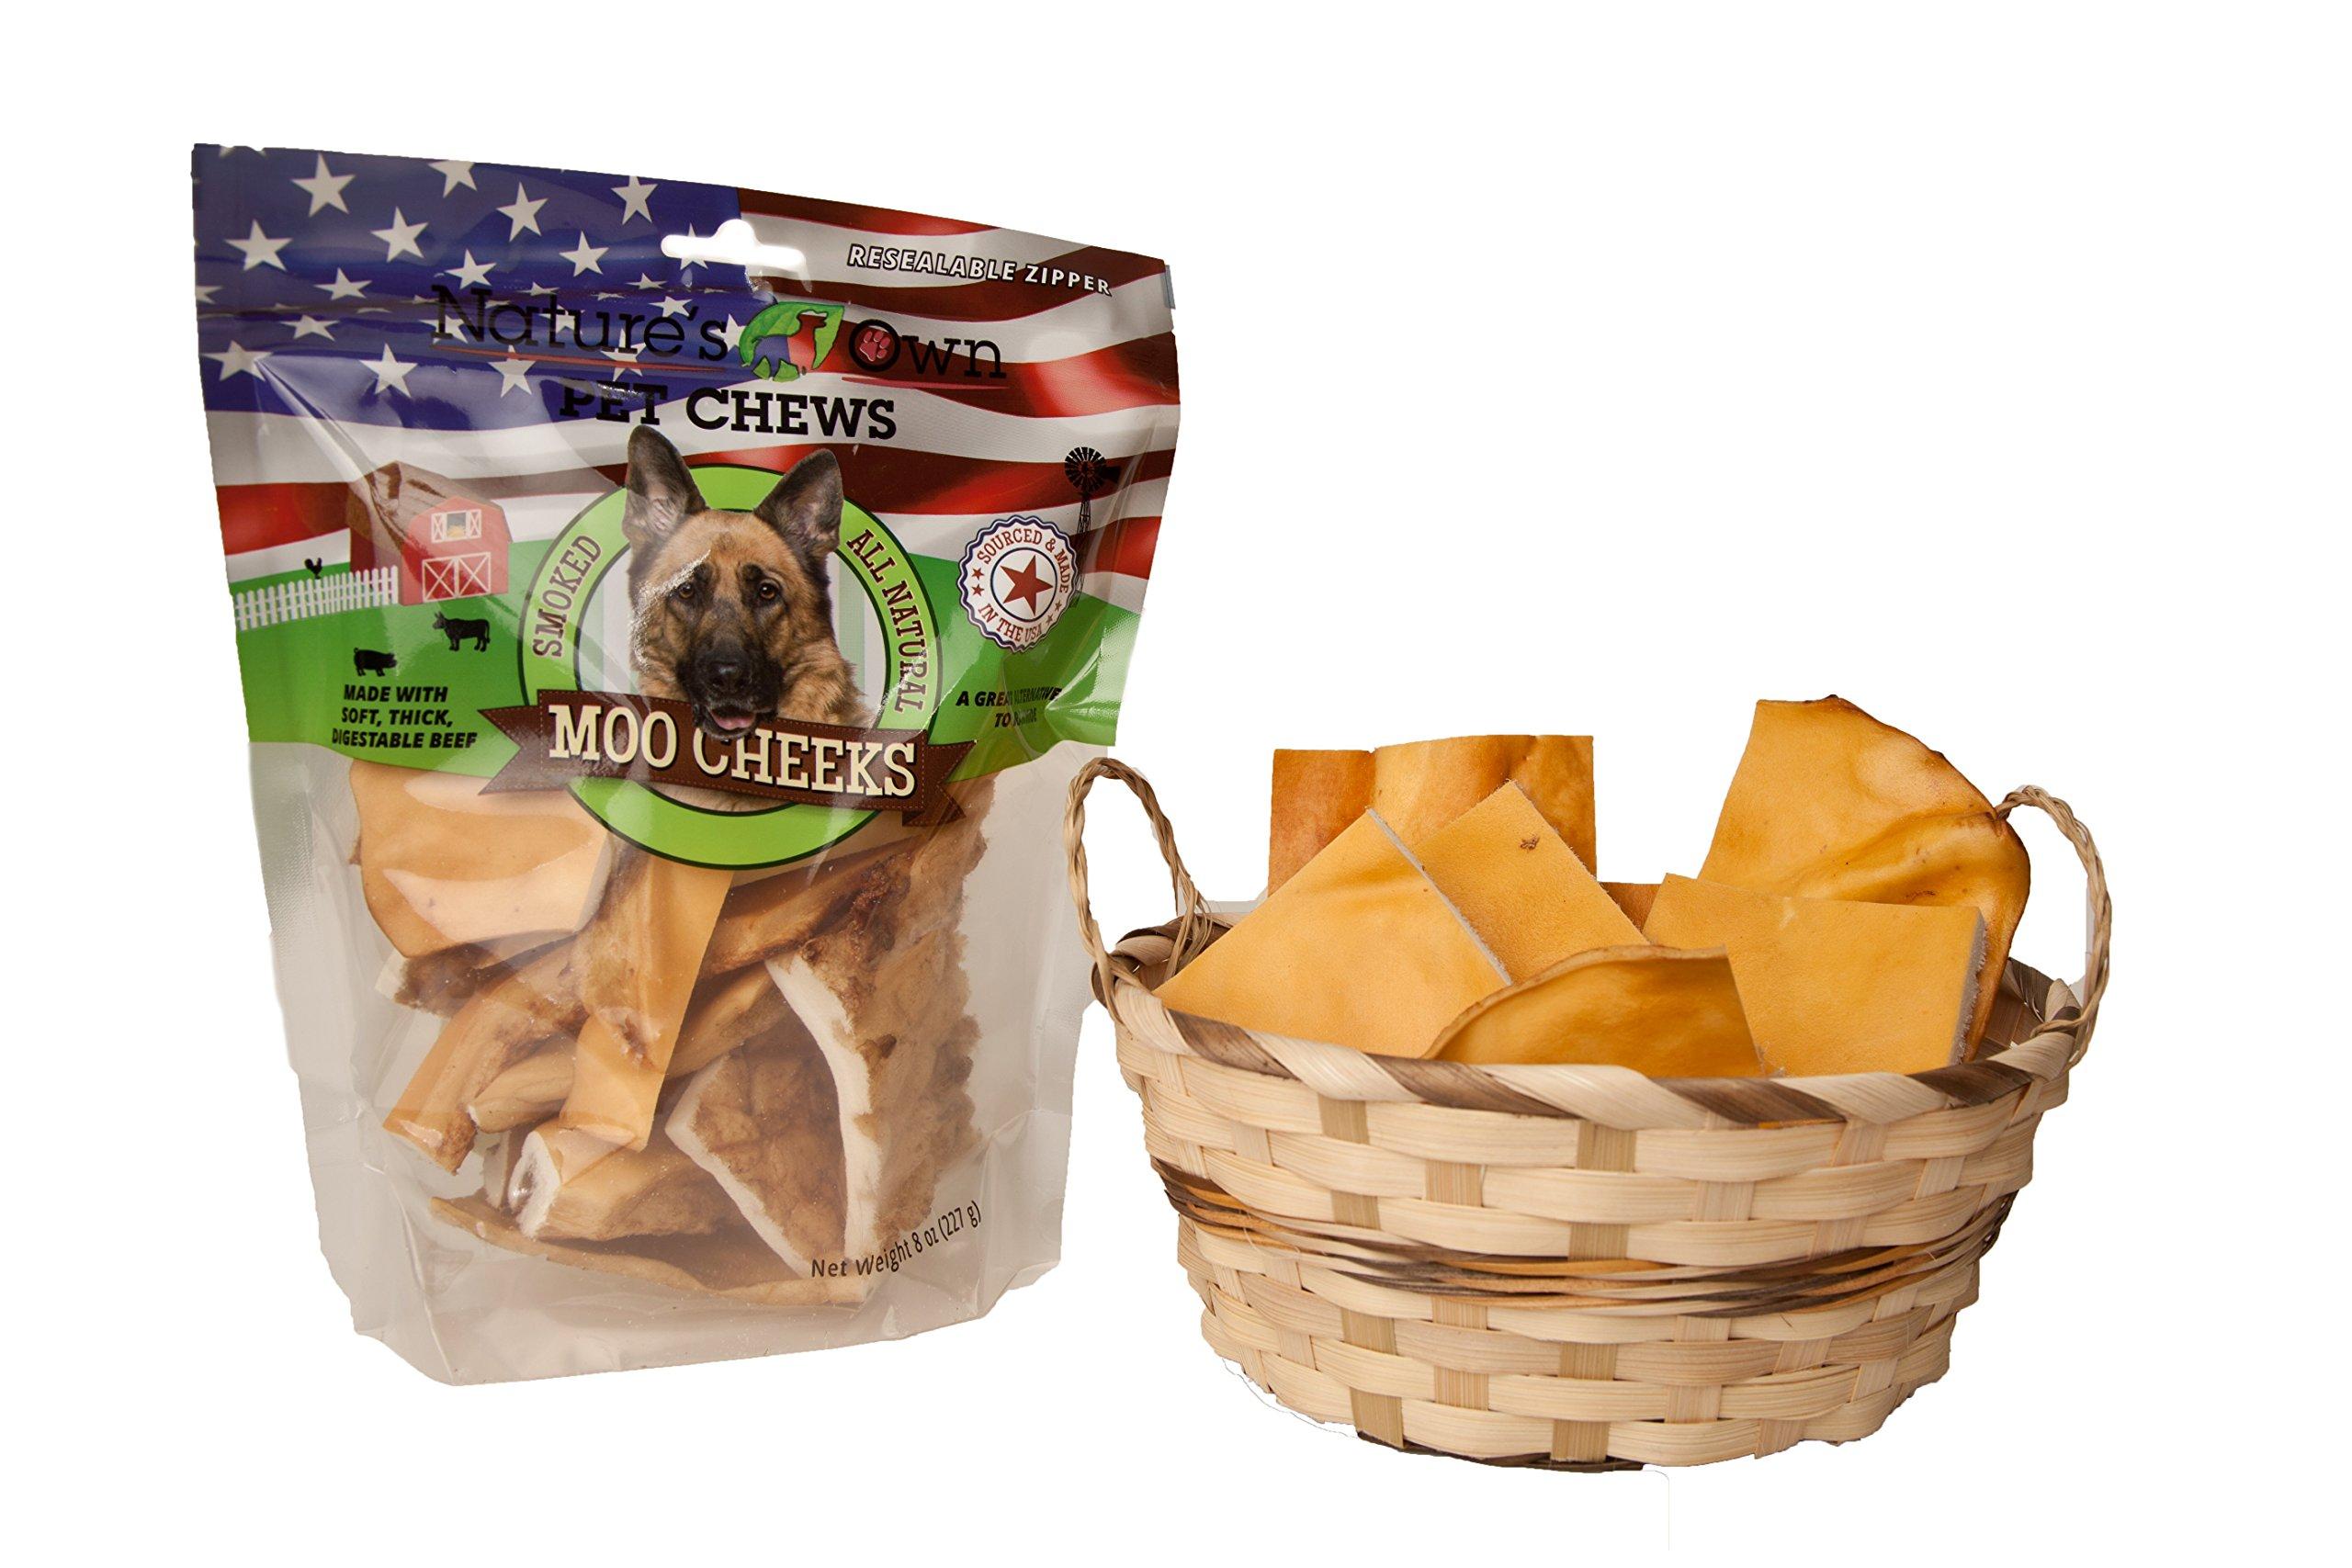 Best Buy Bones Nature's Own Pet Chews Moo Cheeks Bag Treat, 8 oz by Best Buy Bones (Image #2)